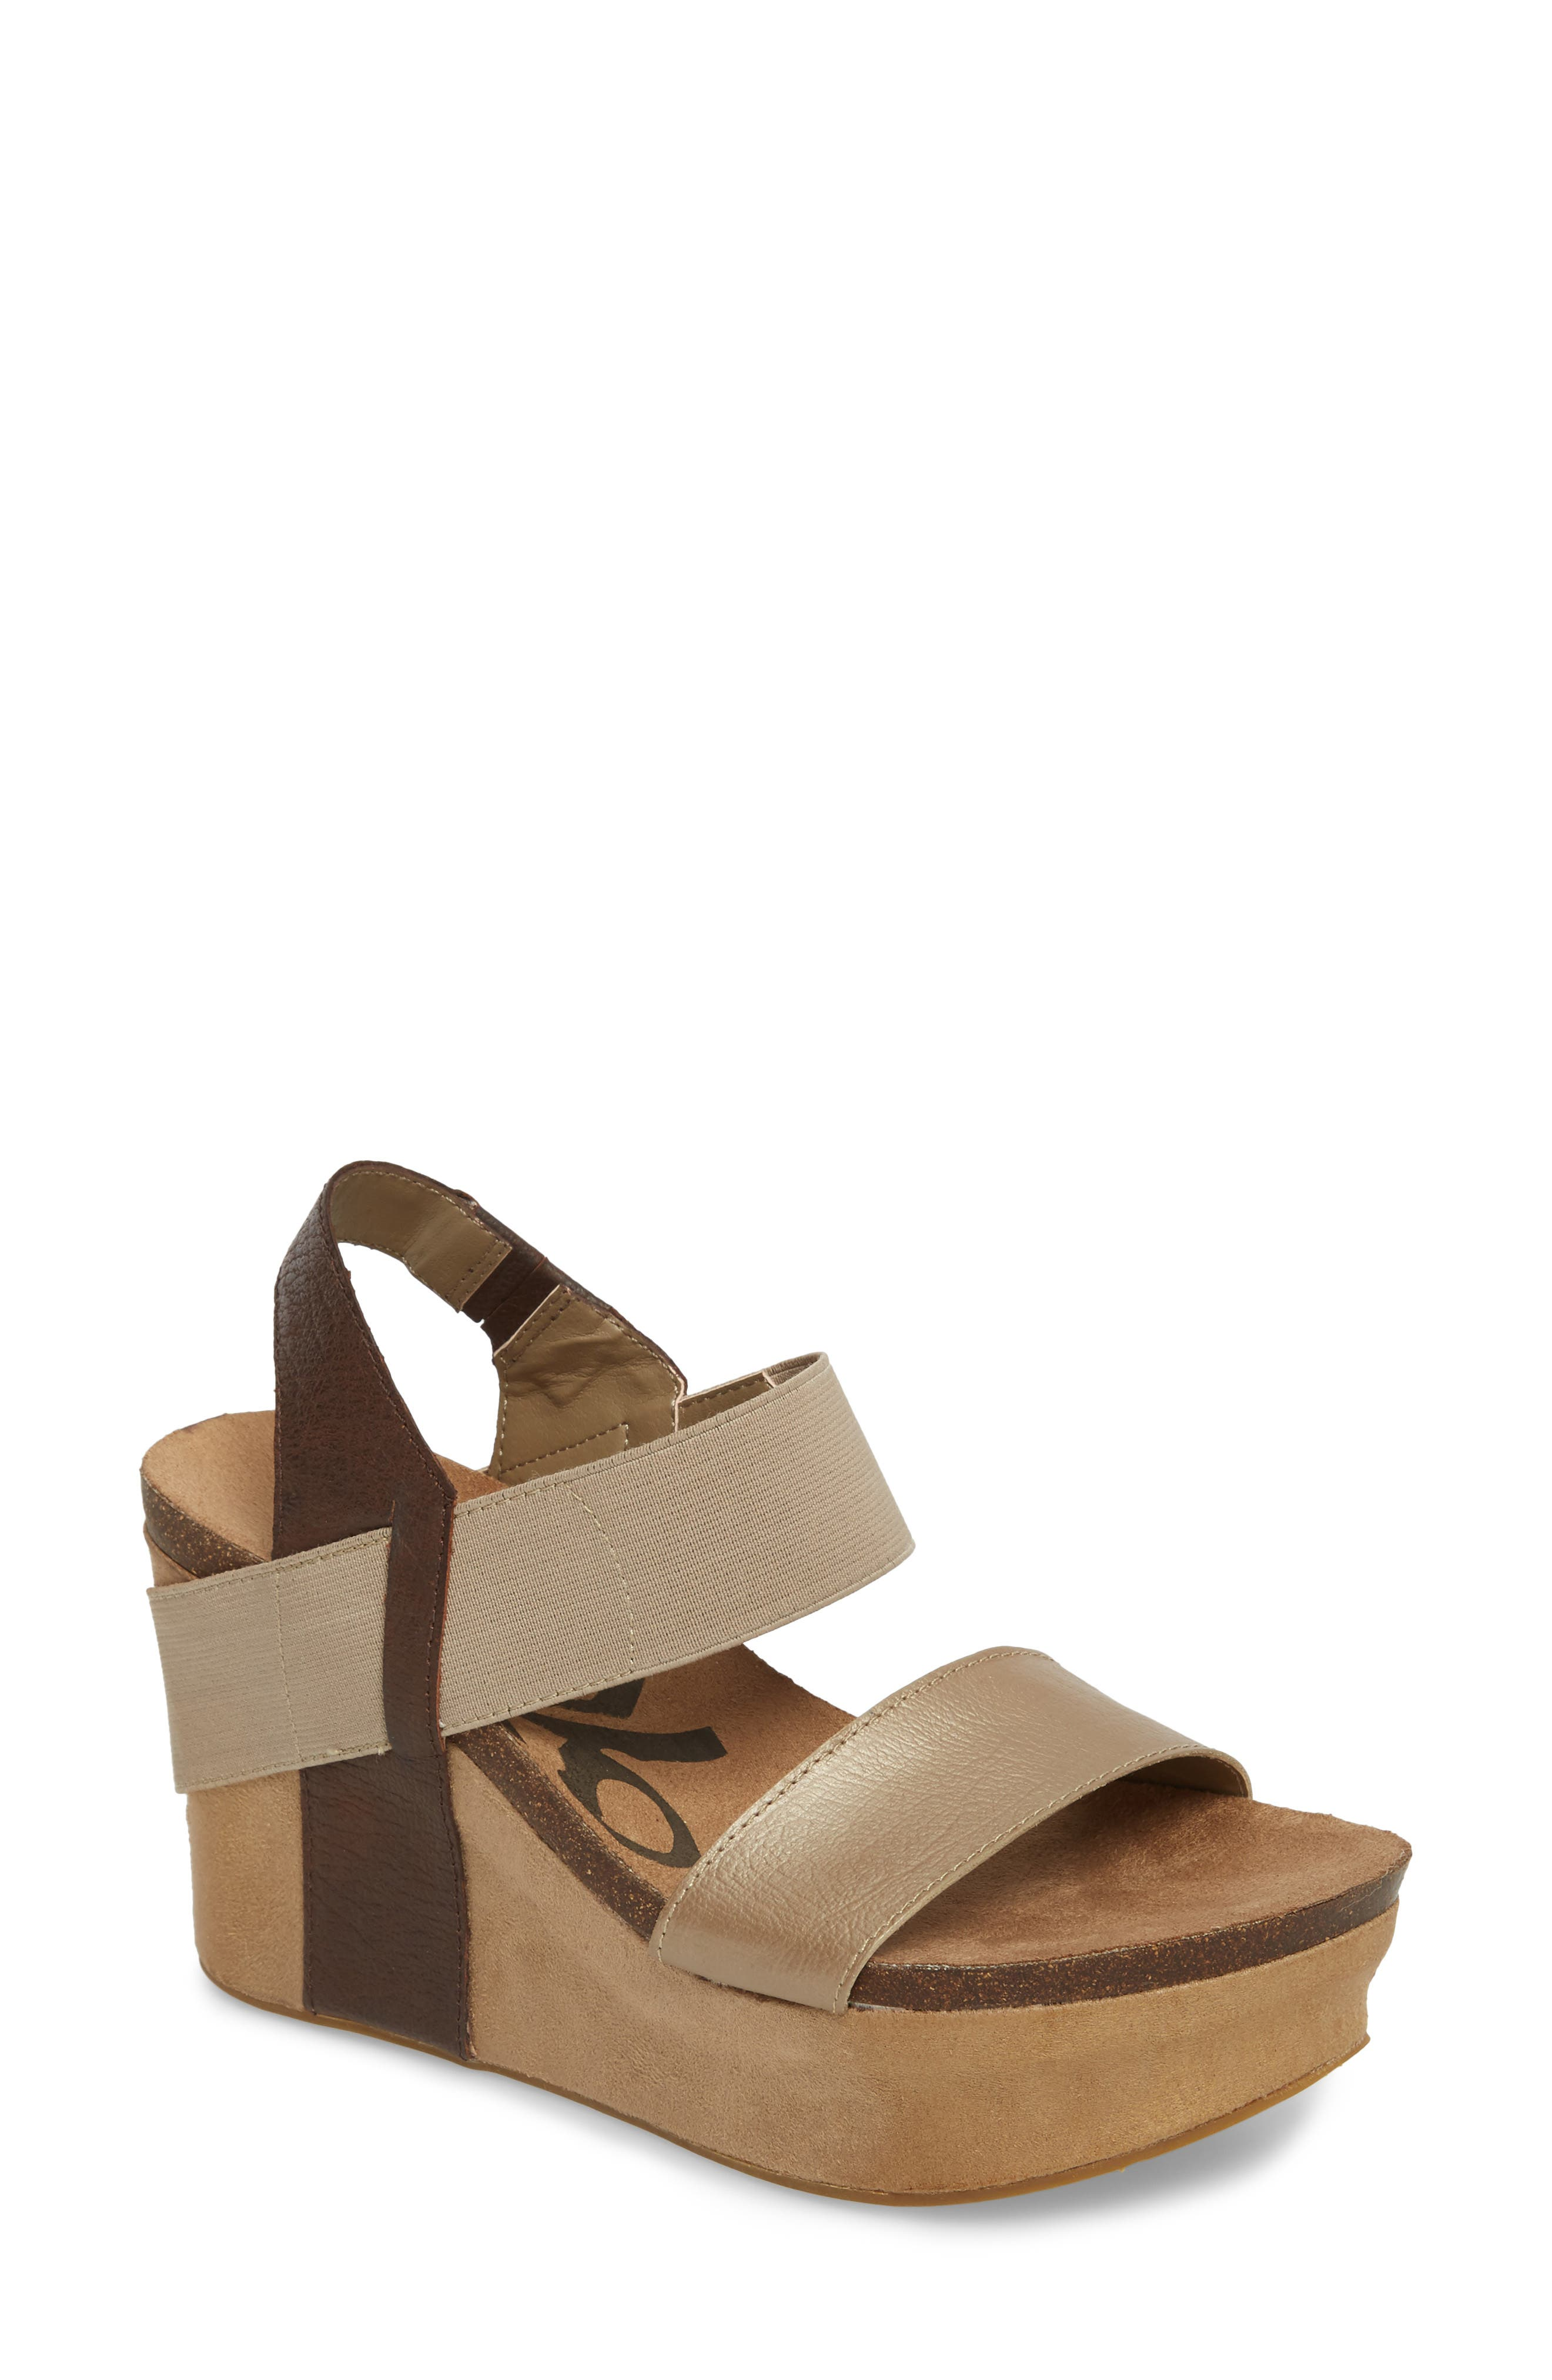 Main Image - OTBT 'Bushnell' Wedge Sandal